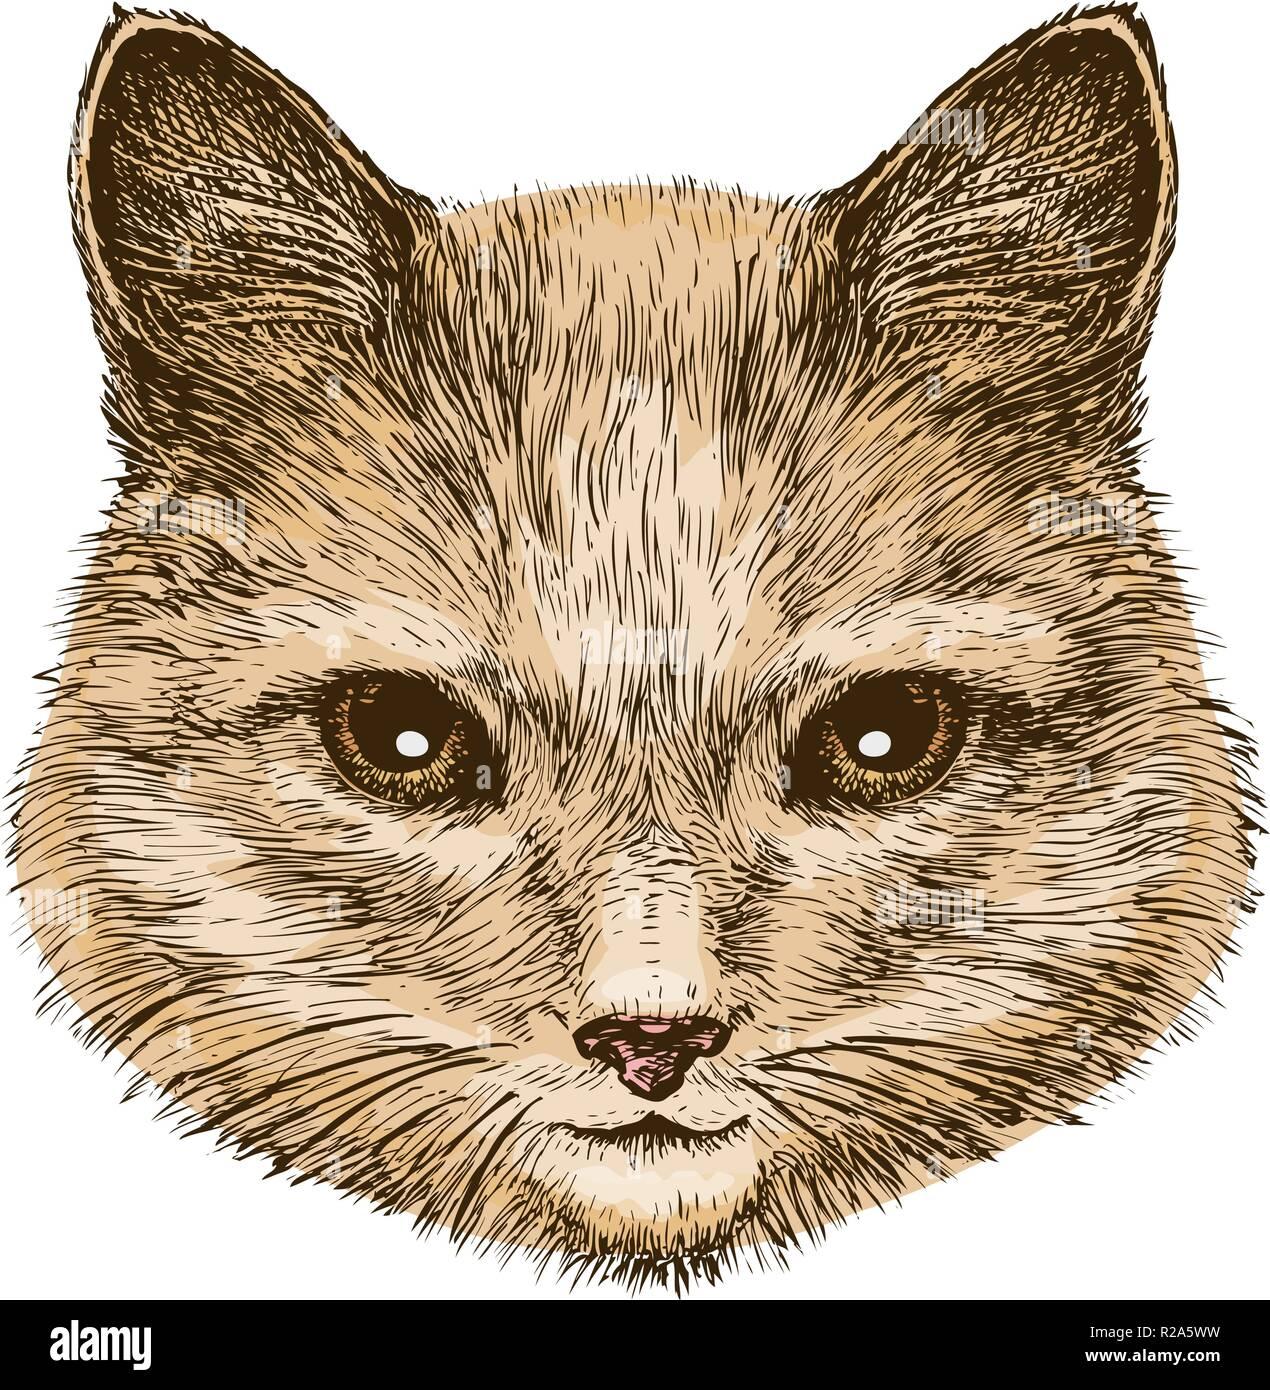 Portrait of a fluffy cat. Sketch vintage vector illustration - Stock Vector